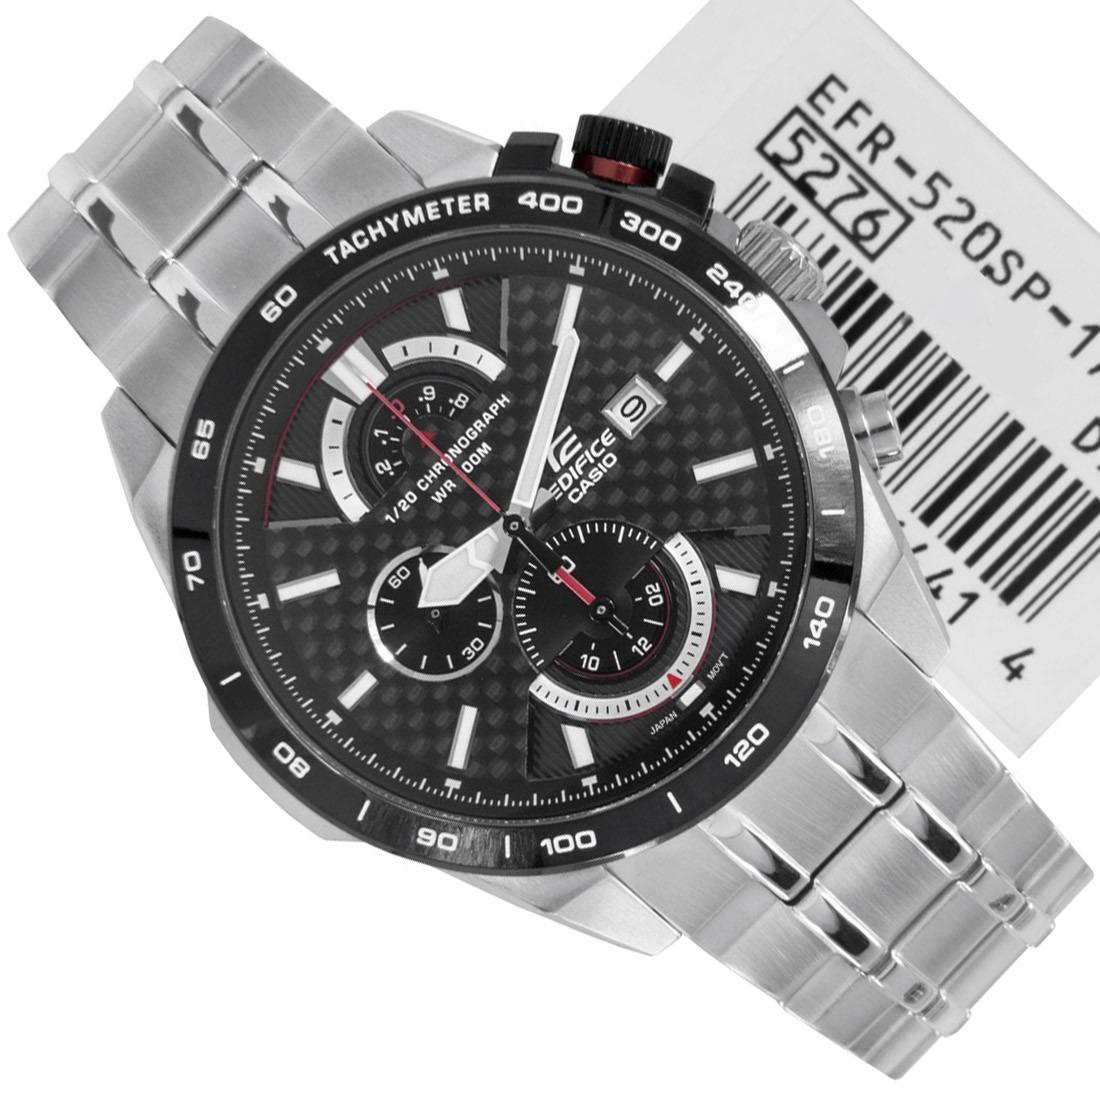 Casio Edifice Efr 303l 1av Hitam Spec Dan Daftar Harga Terbaru 539l Chronograph 520 Series 3